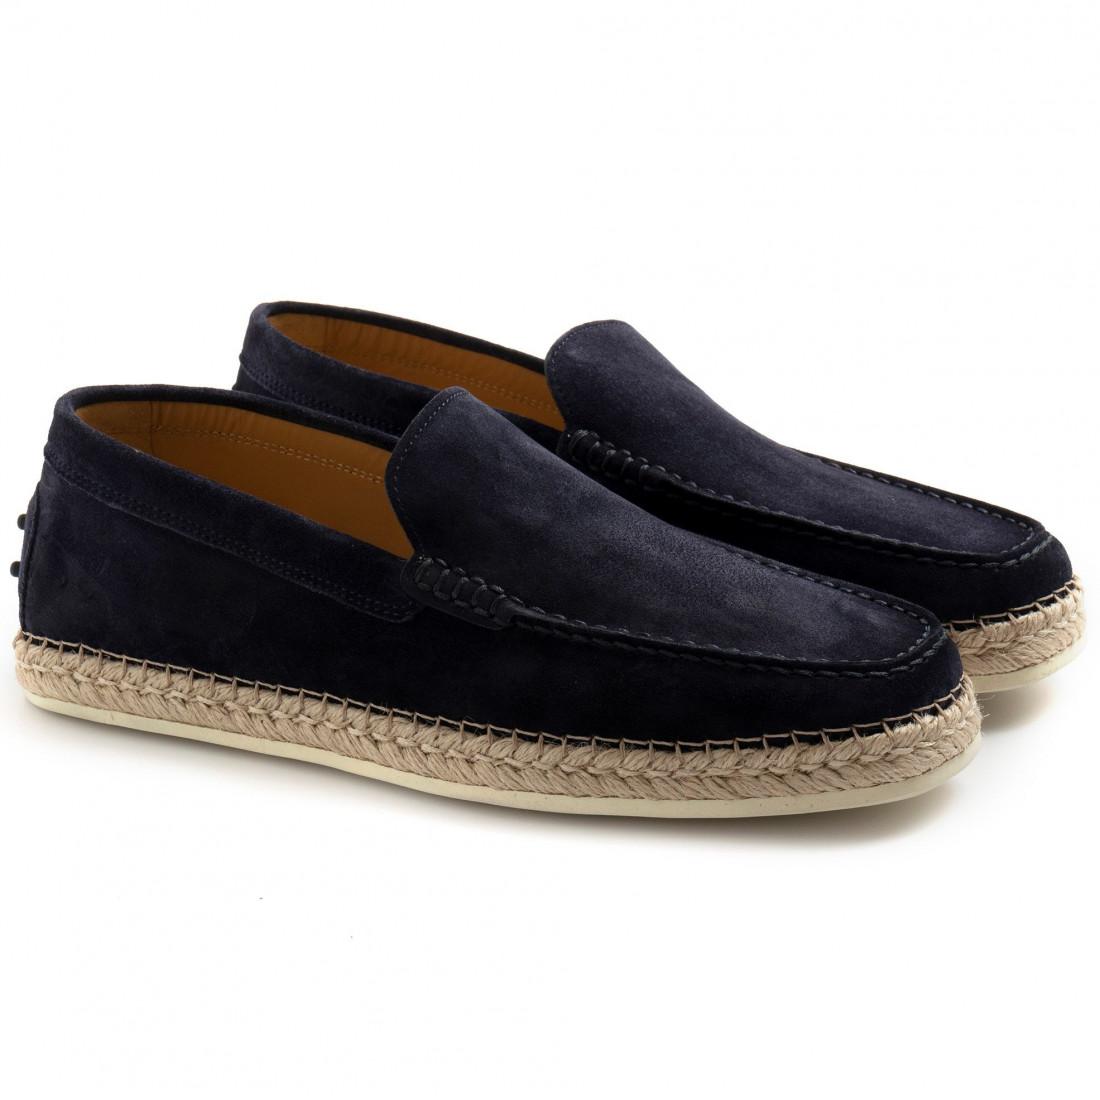 slipper herren rossano bisconti 462 01soft blu 501 8391